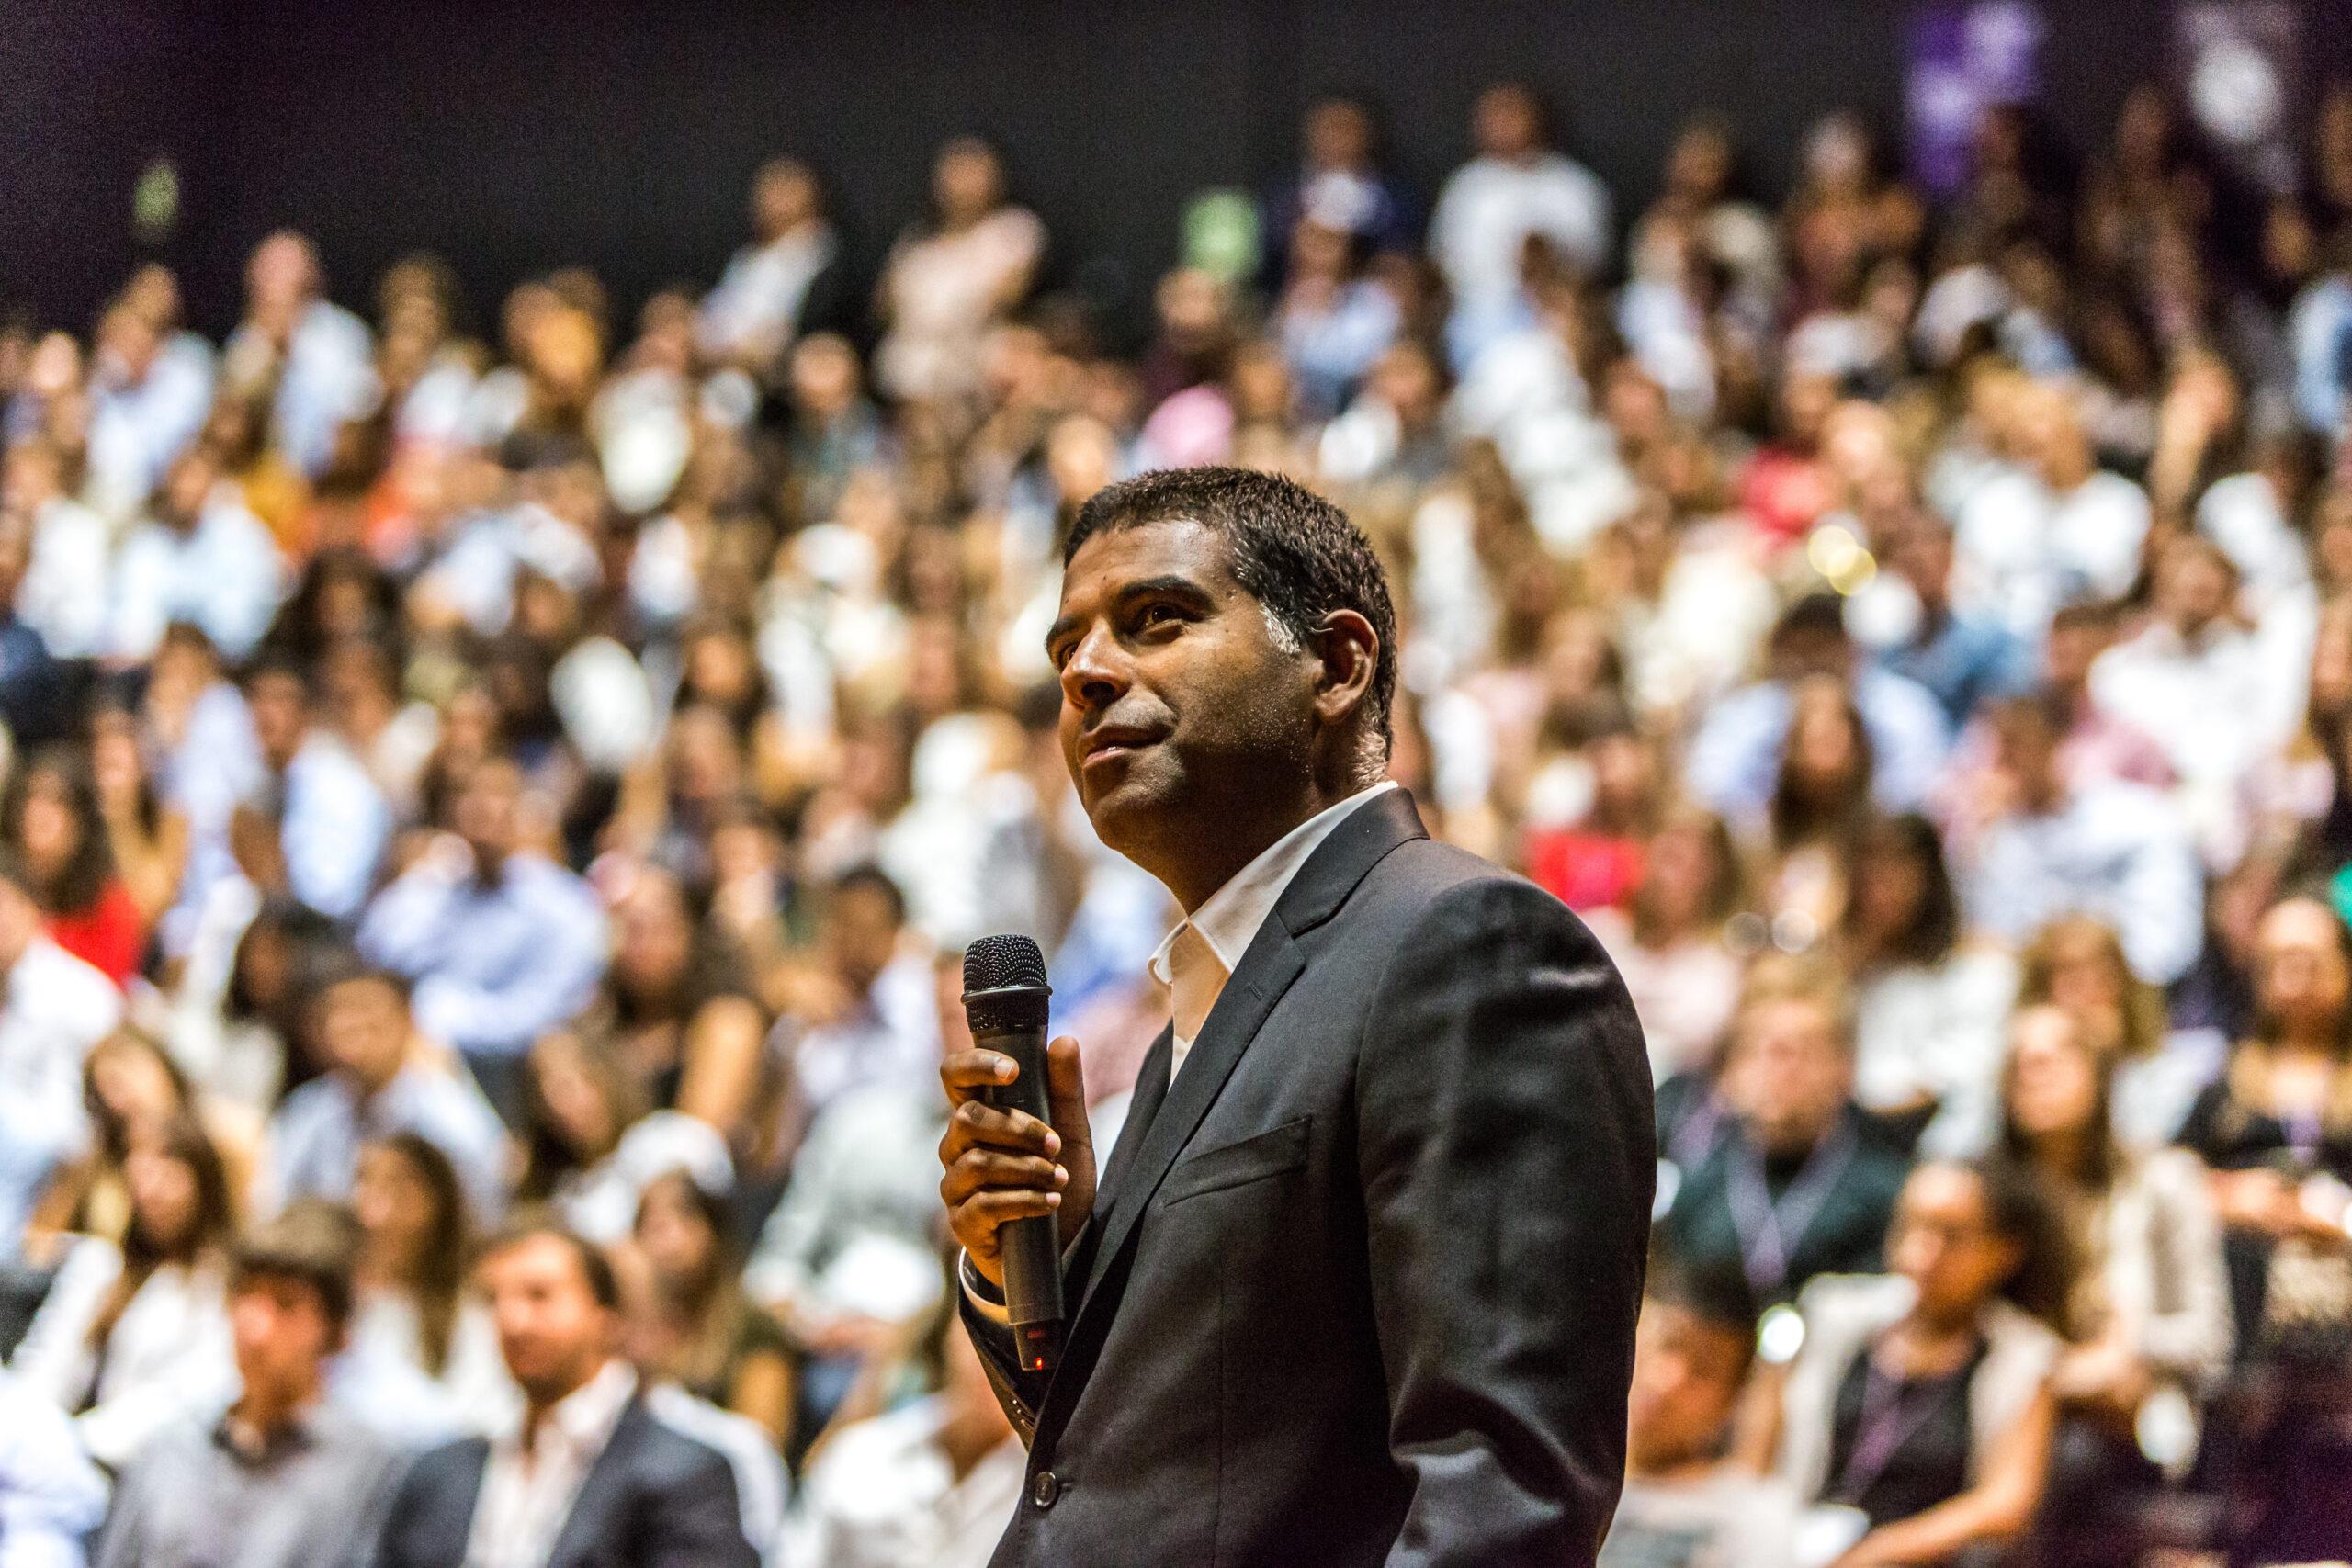 Daniel Traca of Nova Business School inspiring the minds of tomorrow